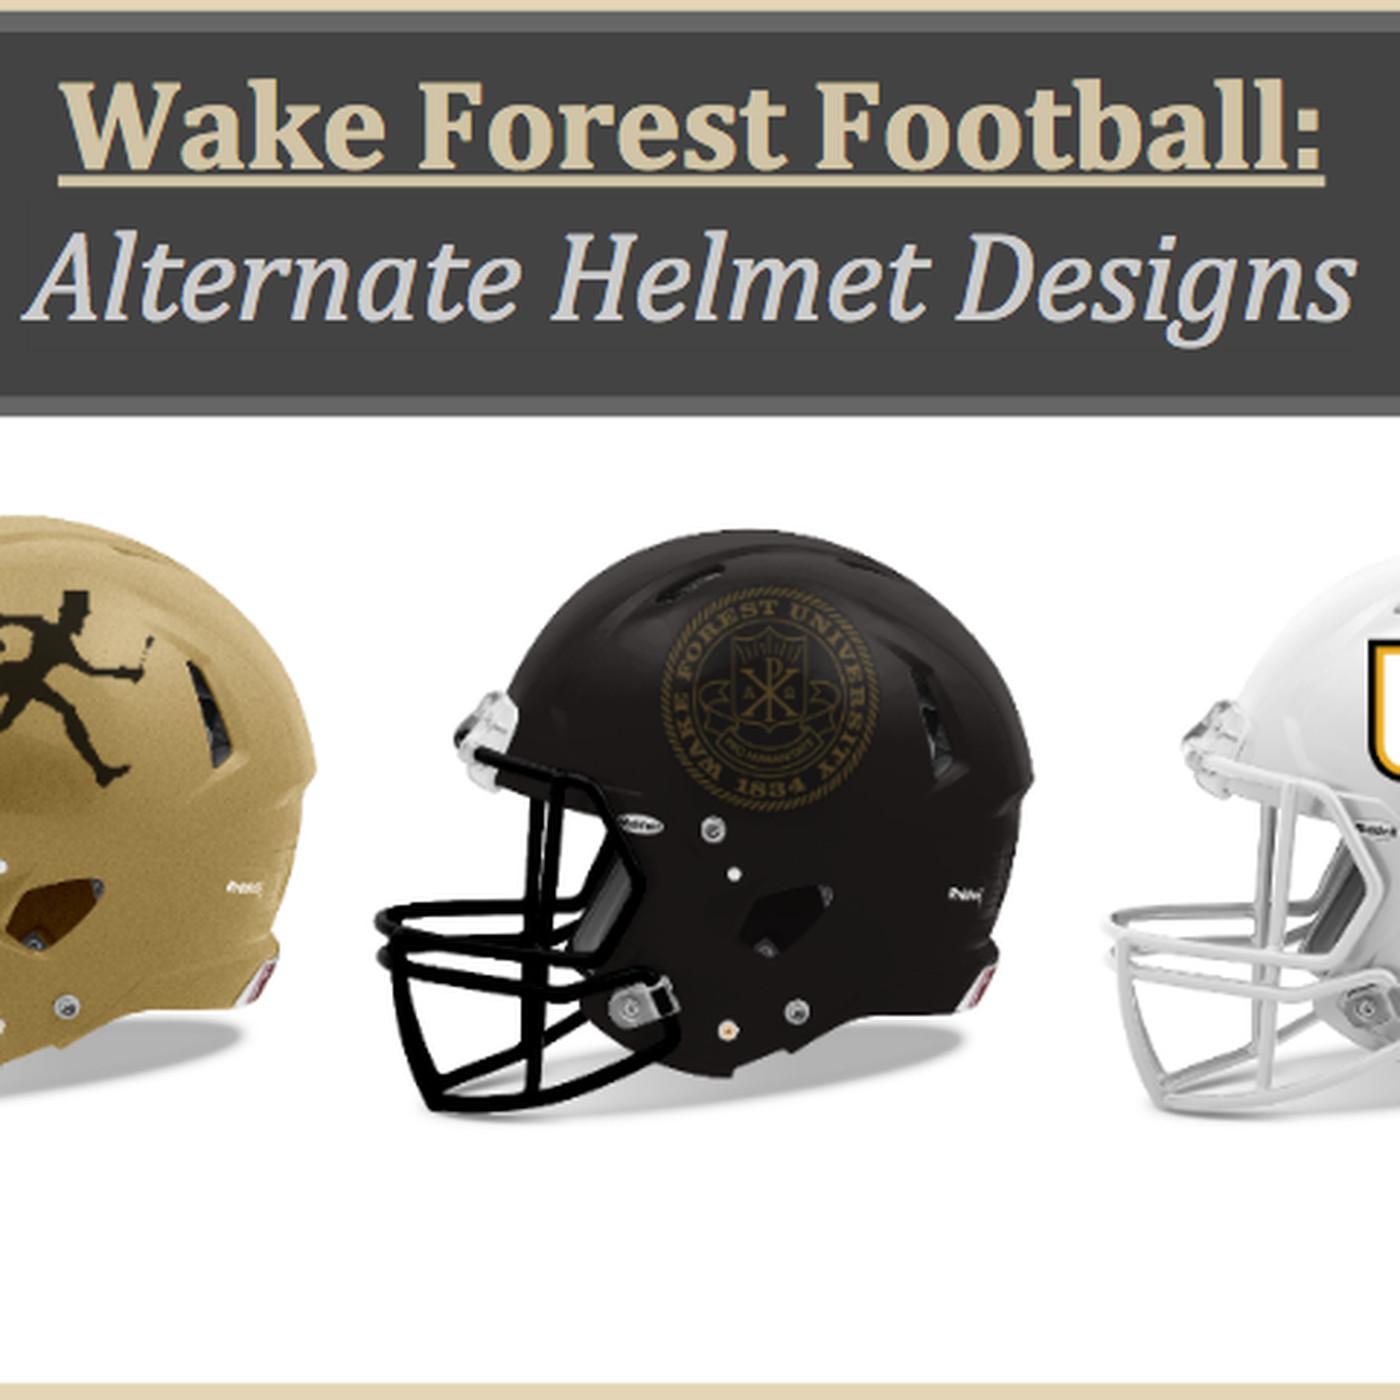 4ea1e8528 Wake Forest Football: New Uniforms? Check Out a Few Alternate Helmet Designs